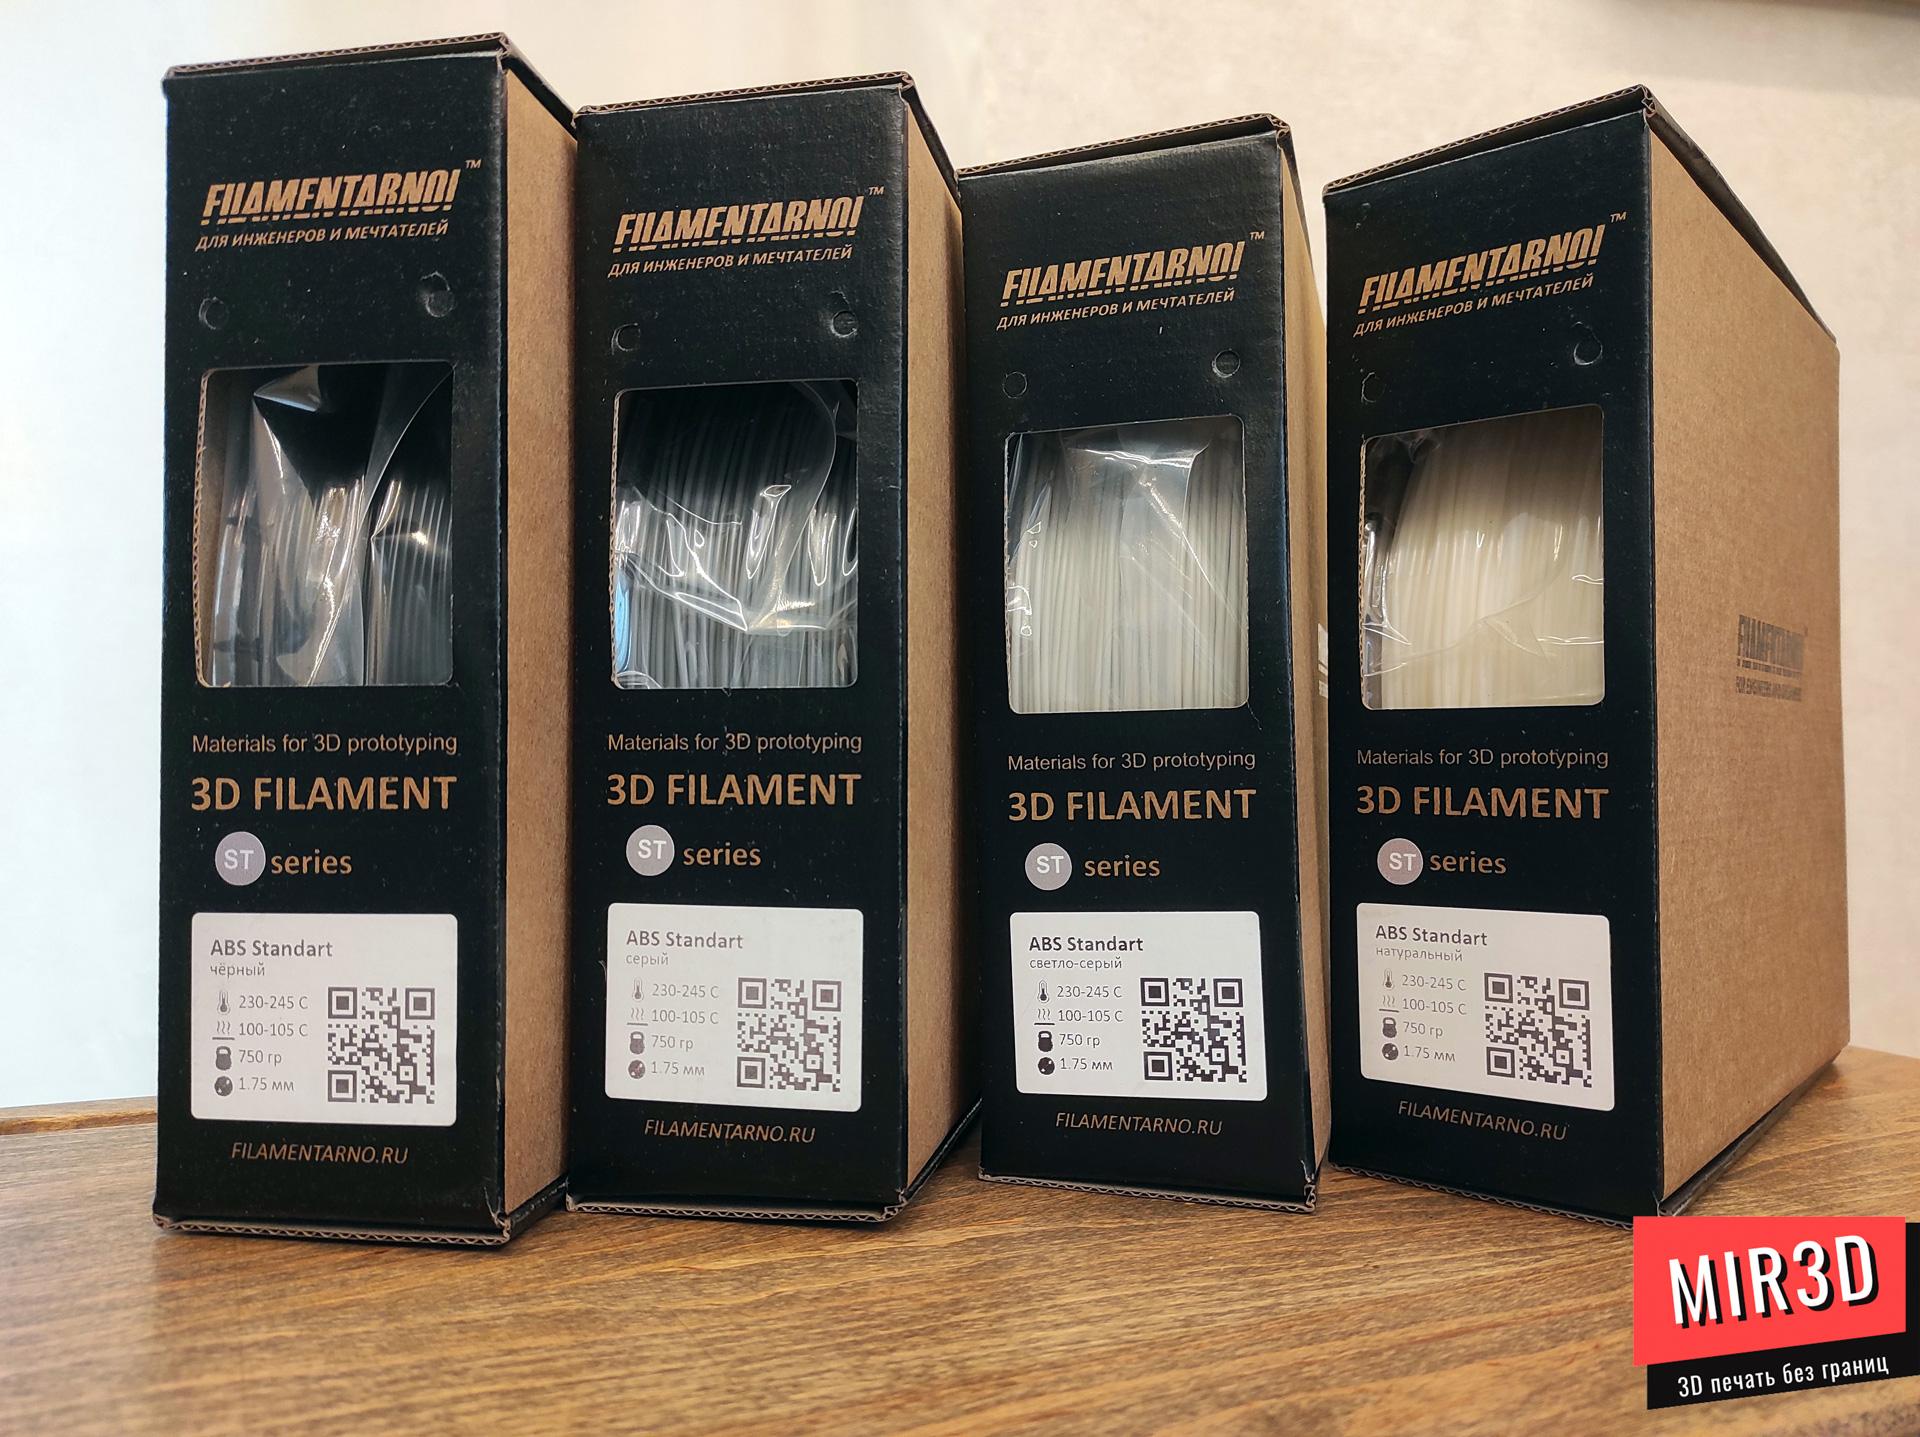 You are currently viewing [ЗАВЕРШЕНО] АКЦИЯ! Пластик для 3D принтера Filamentarno! ABS Stanfart по цене ниже чем у производителя